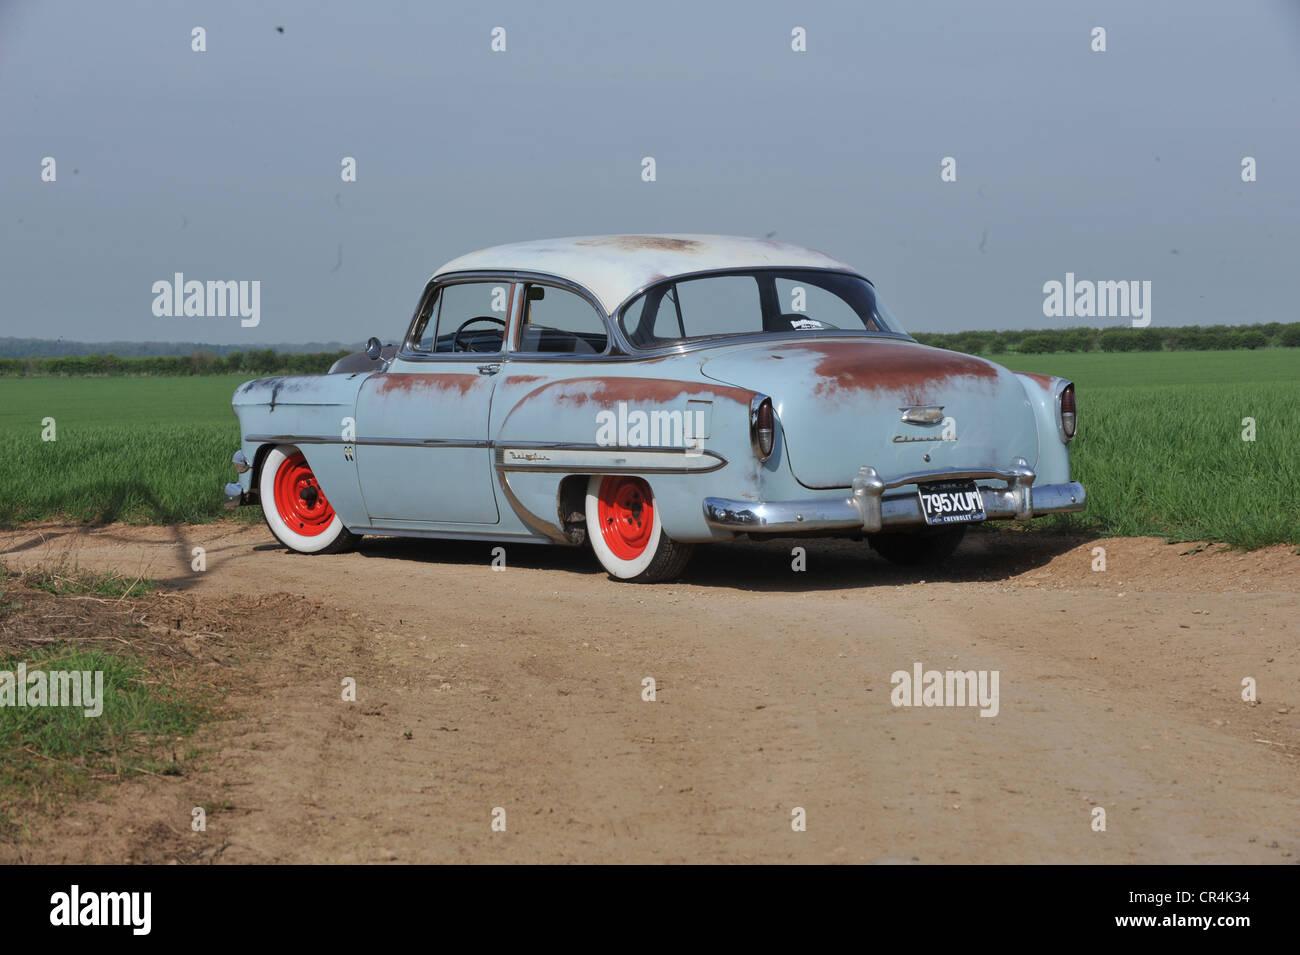 All Chevy 1954 chevrolet belair : Rat look 1954 Chevrolet Bel air classic sun bleached American car ...